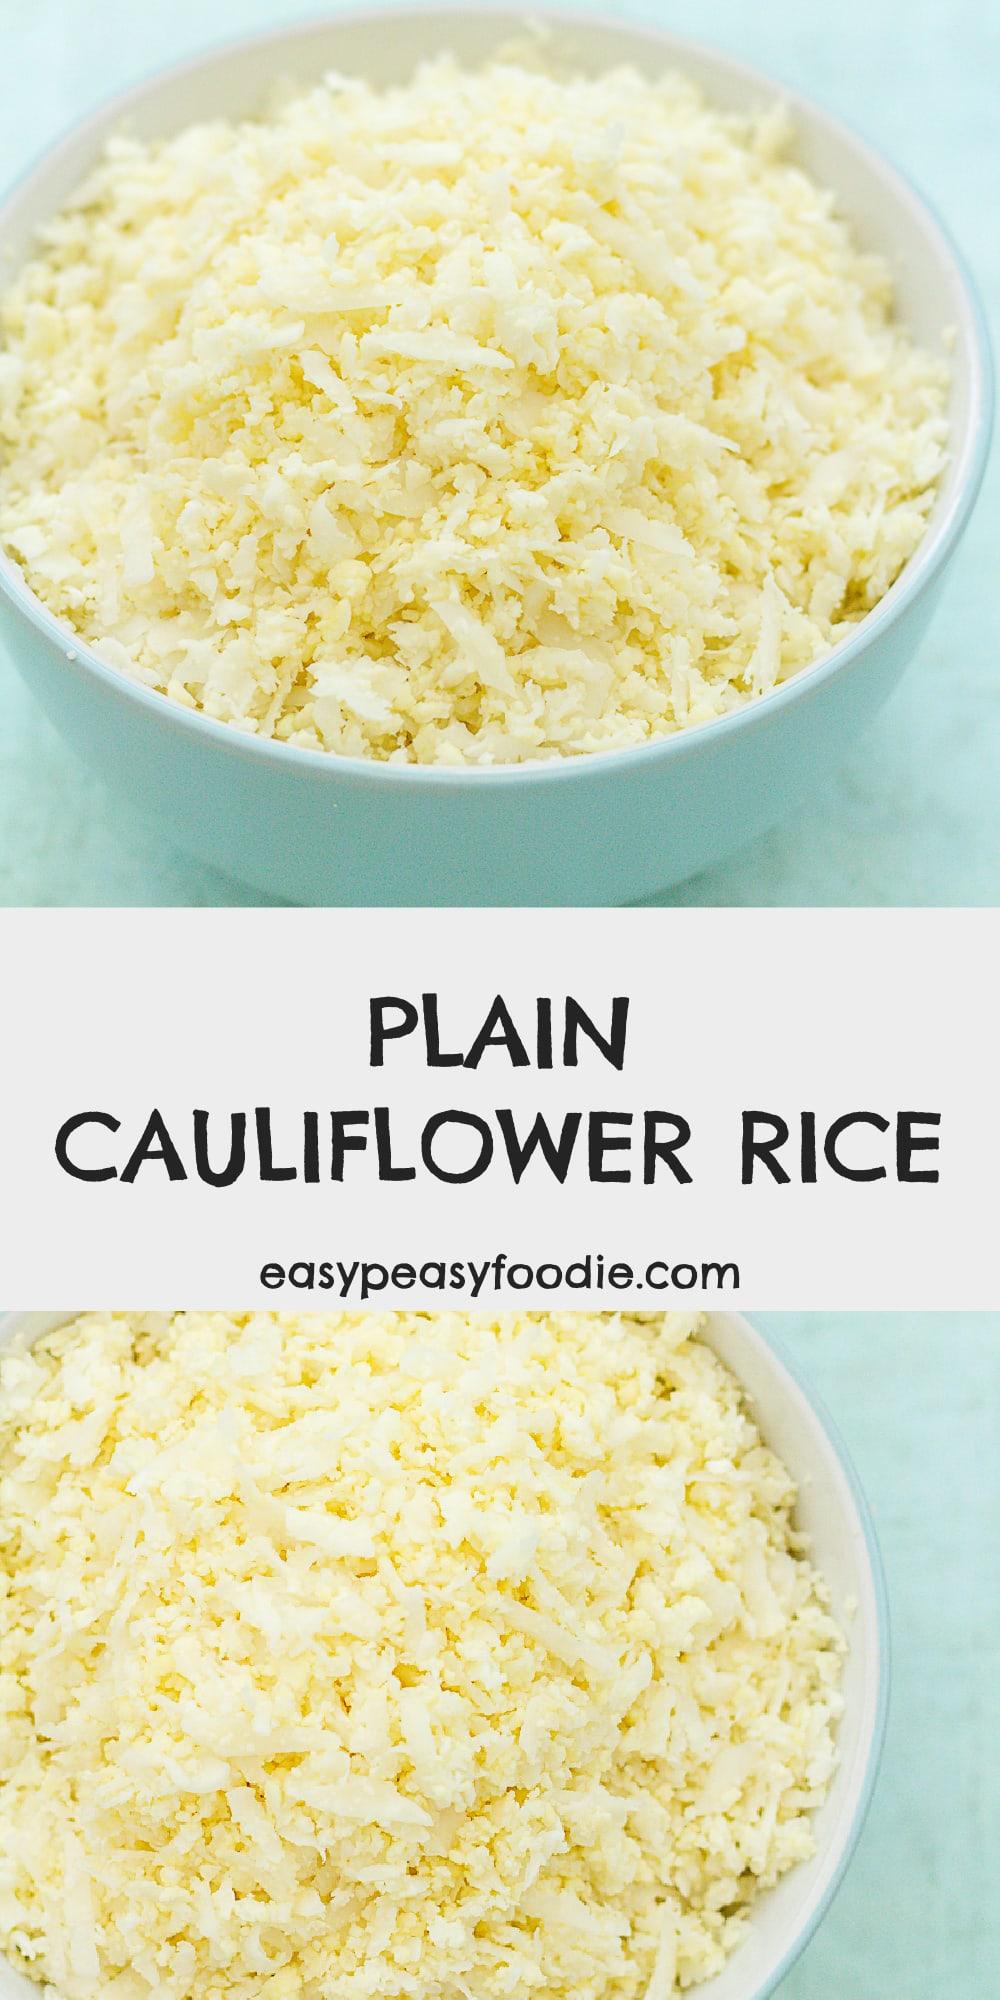 Plain Cauliflower Rice - Pinnable image for Pinterest